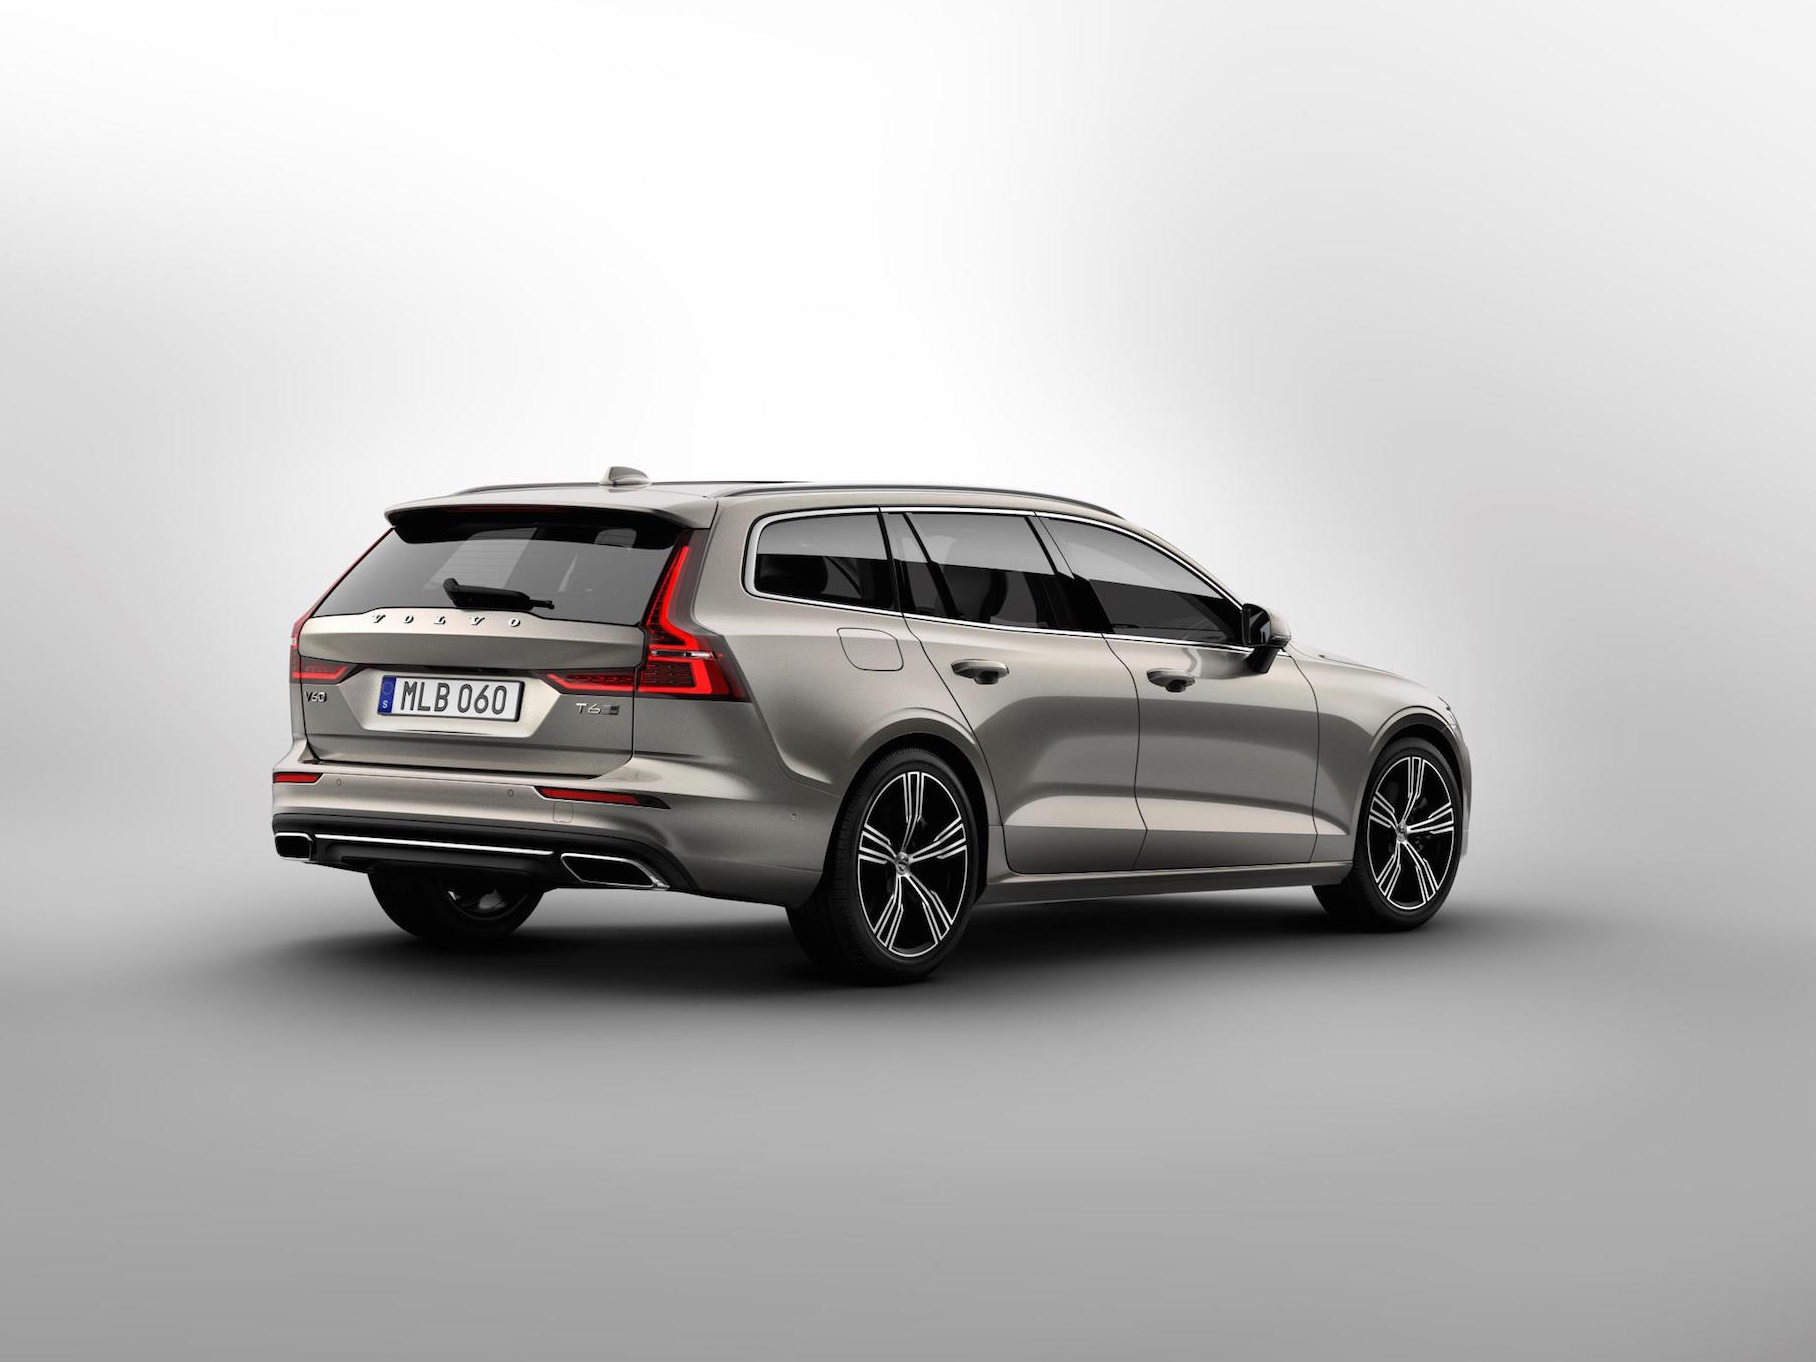 2020 Volvo XC70 Comeback News >> Volvo S V60 New Station Wagon Is Simply Stunning